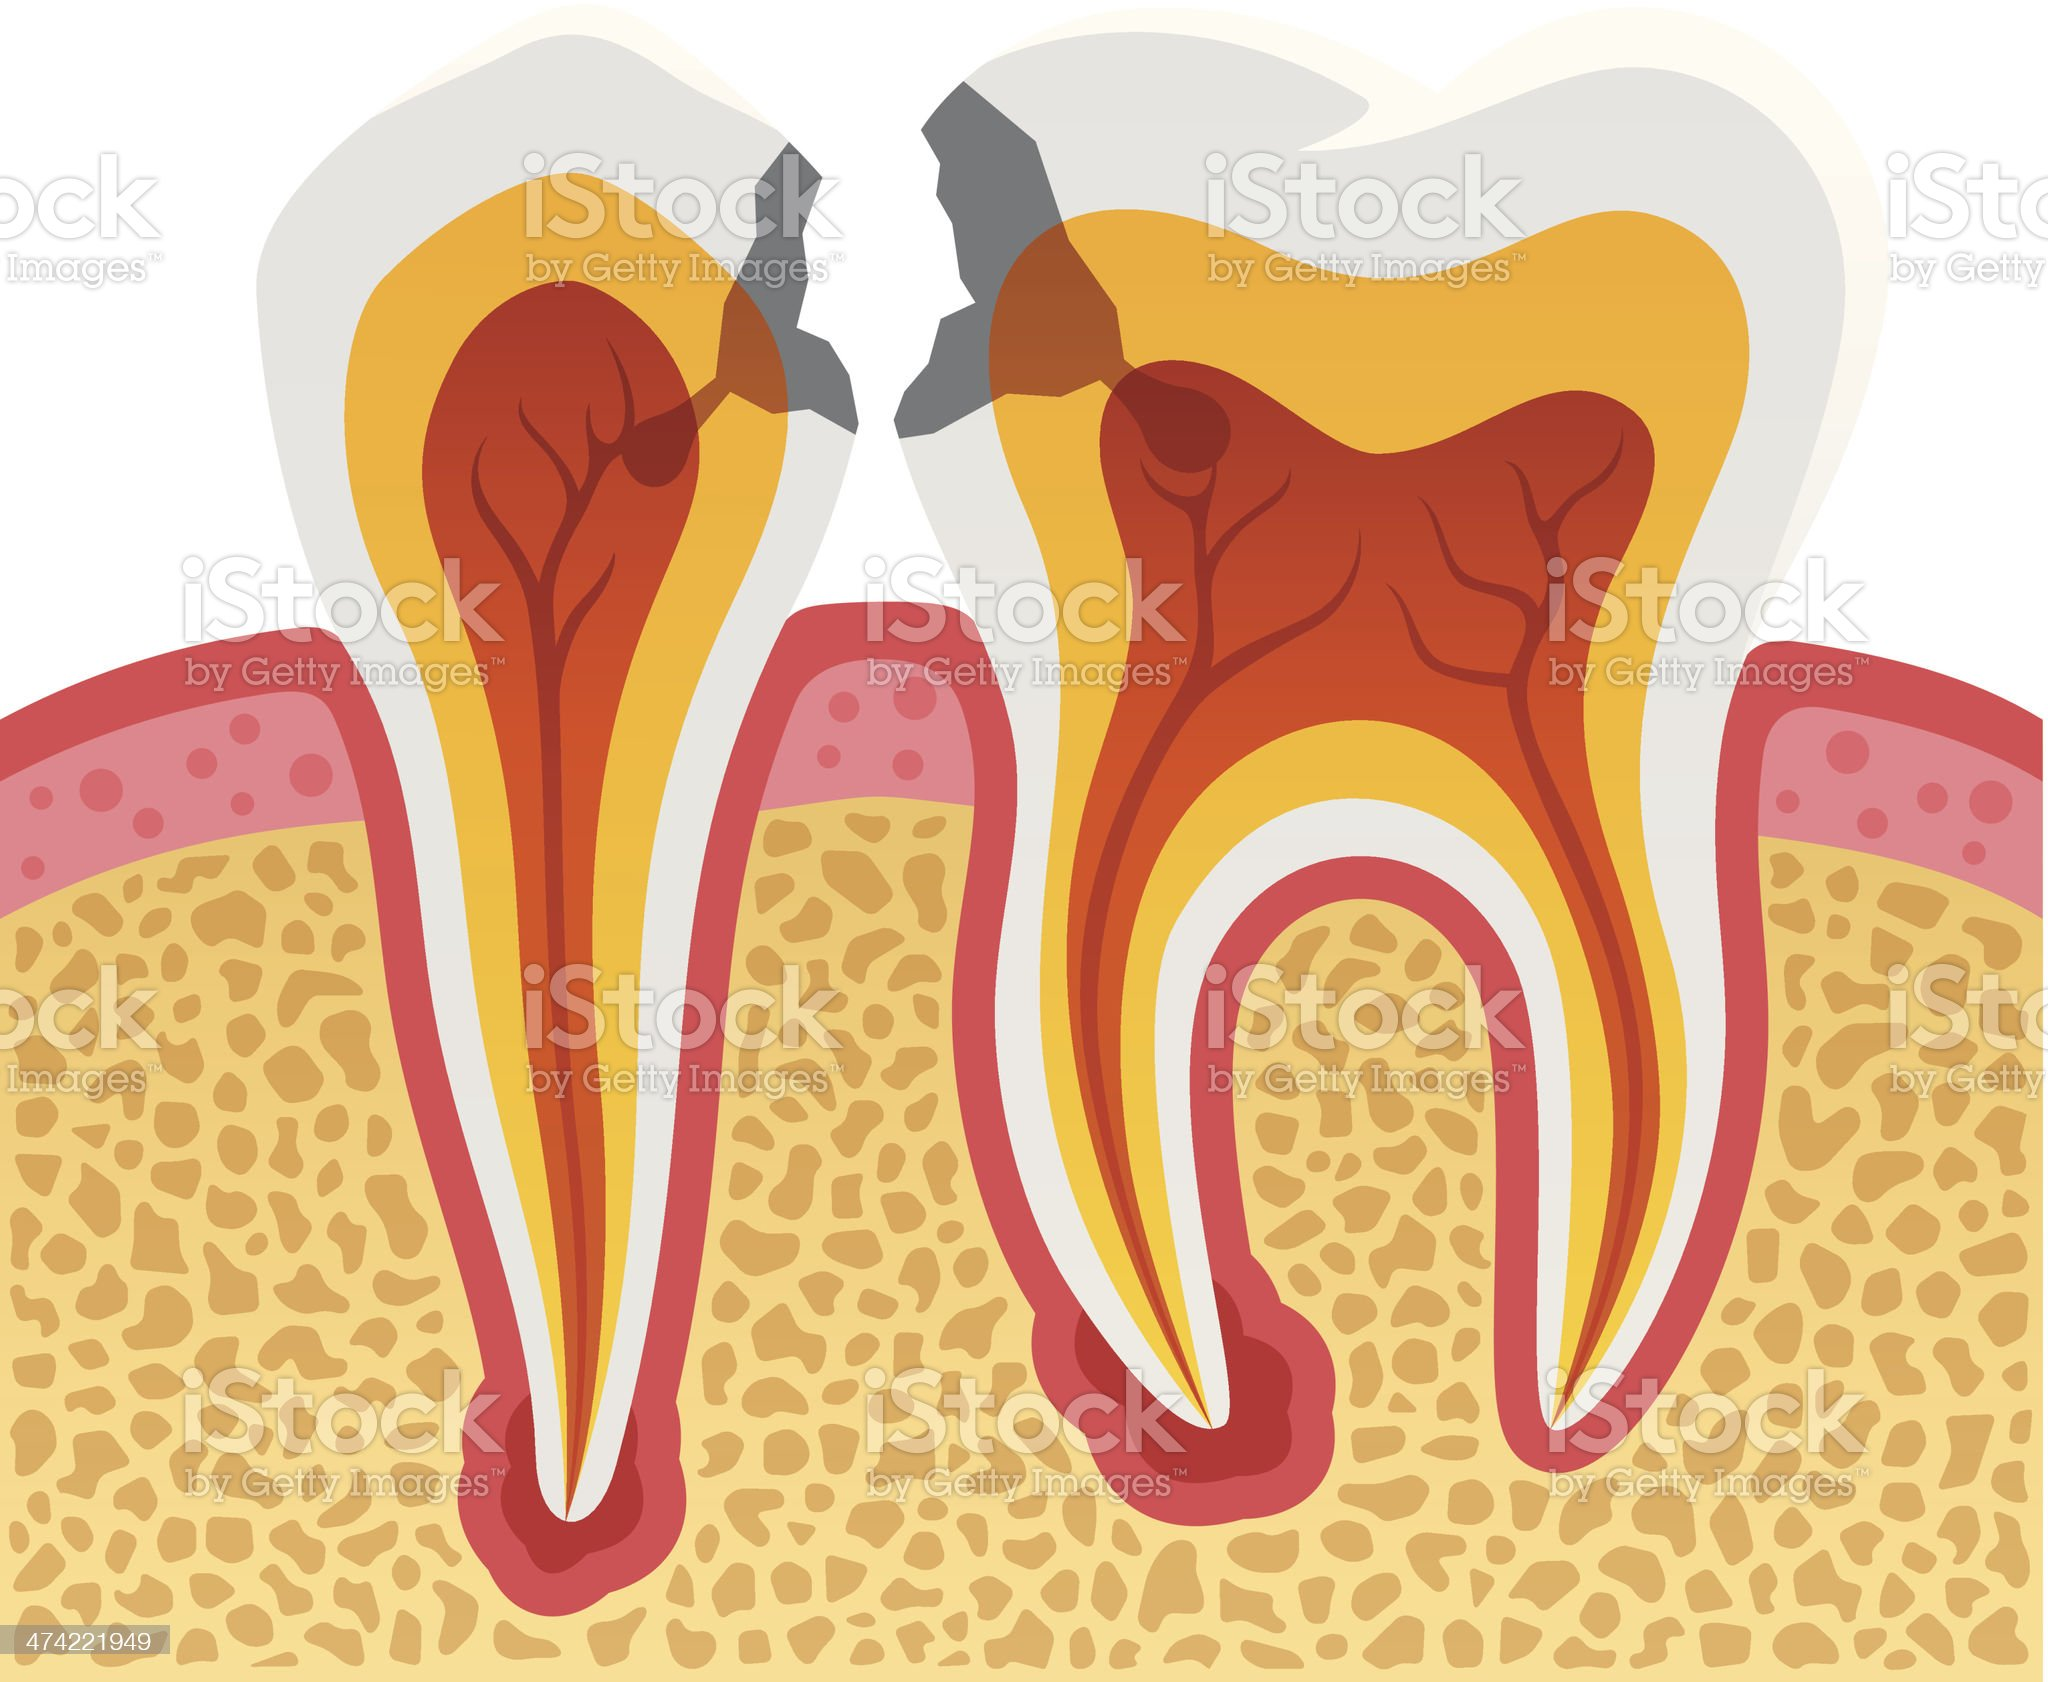 Dental Cavities royalty-free stock vector art